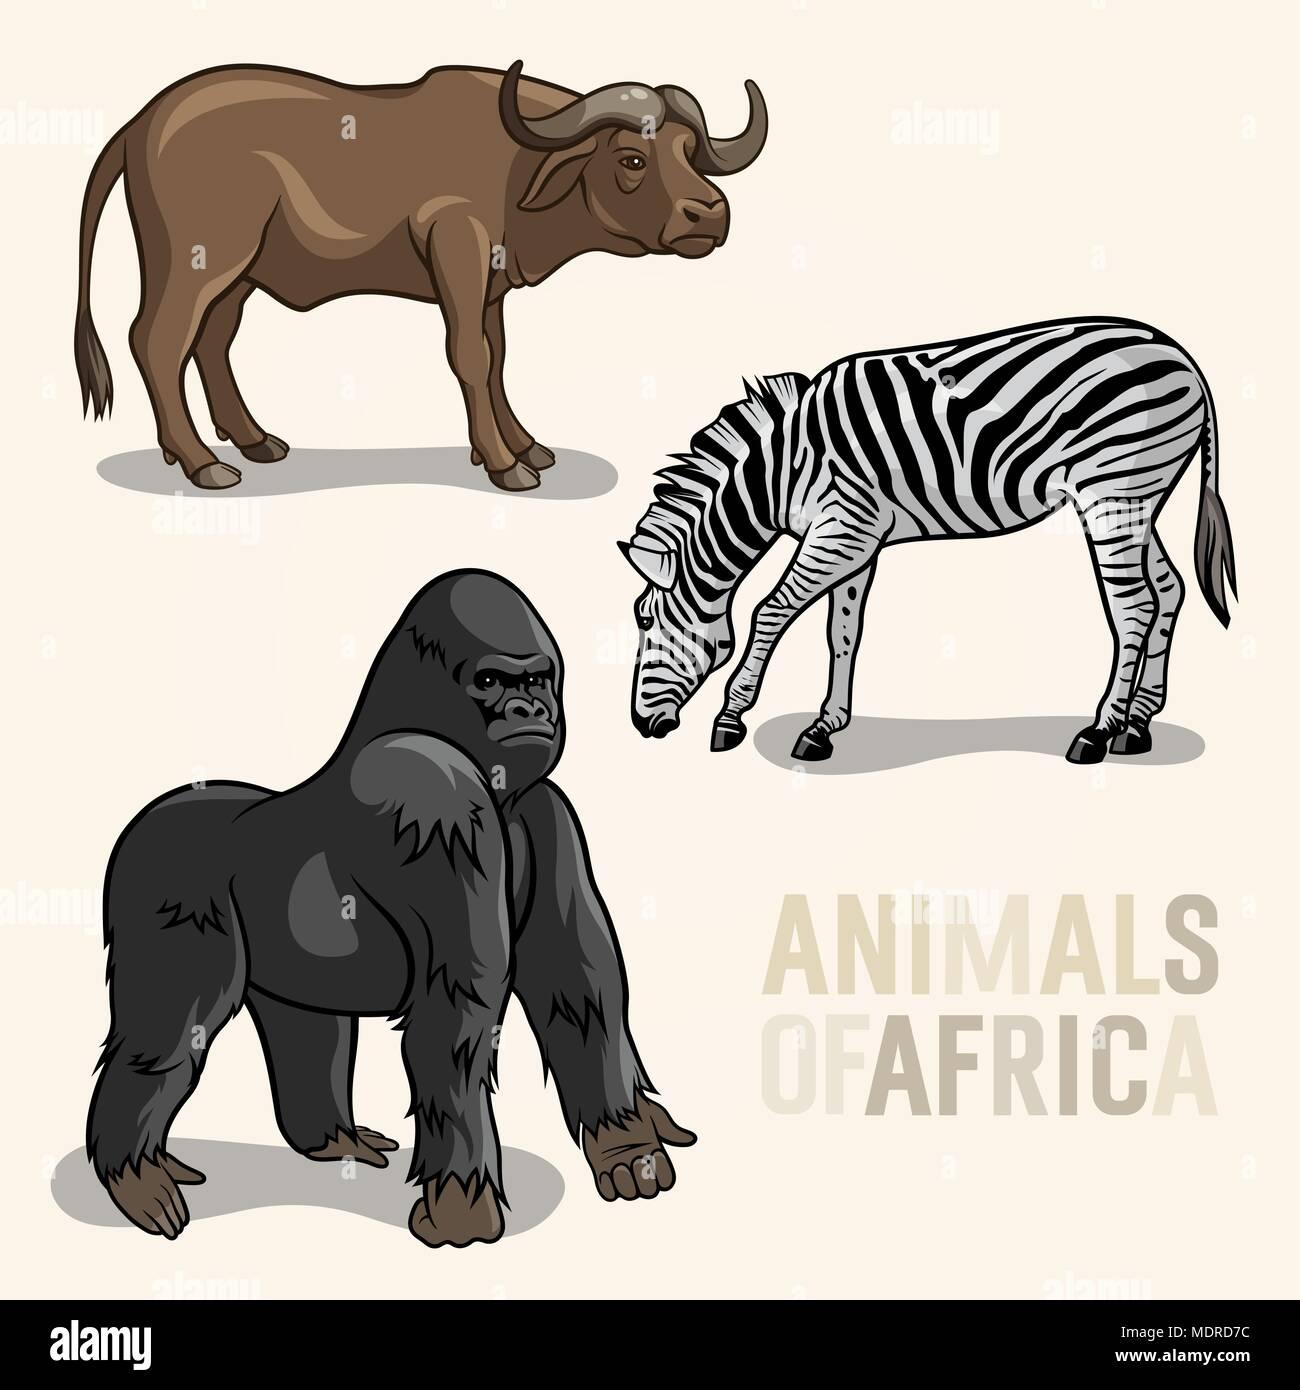 Vector set of African Animals. Gorilla, buffalo and zebra - Stock Image